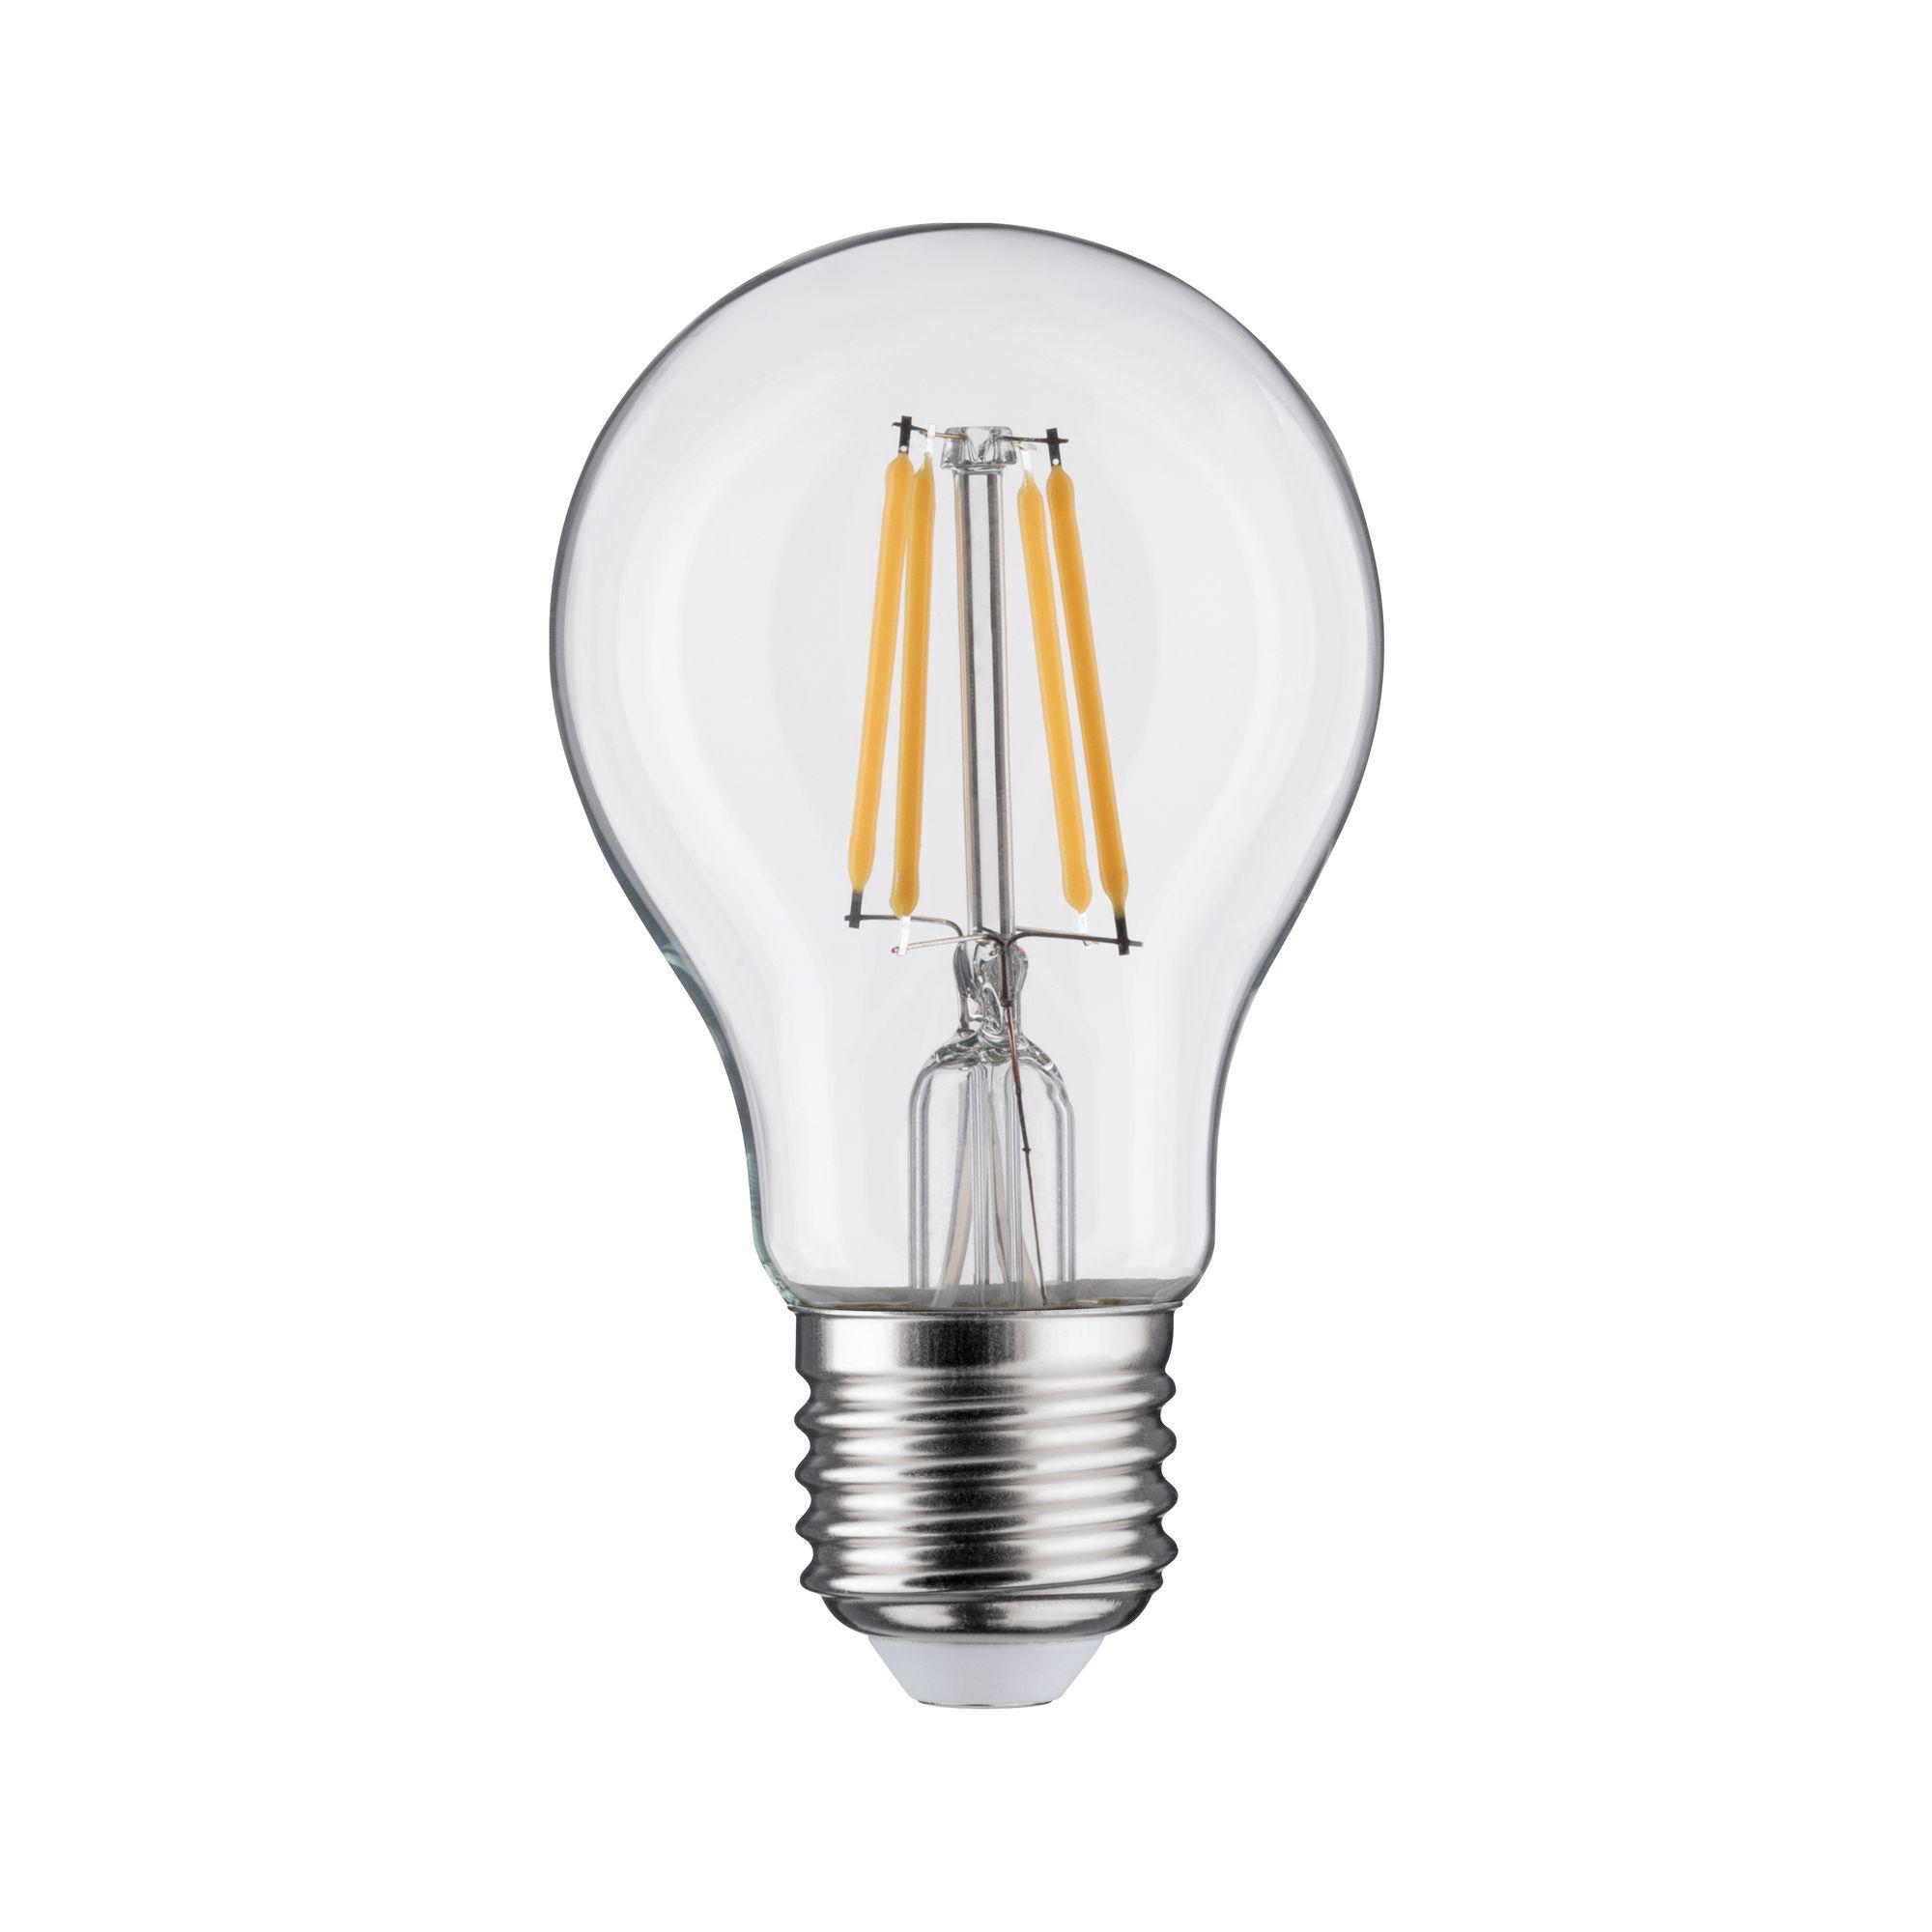 Paulmann LED Fil AGL 470lm E27 2700K klar dim 5W 230V (28616)